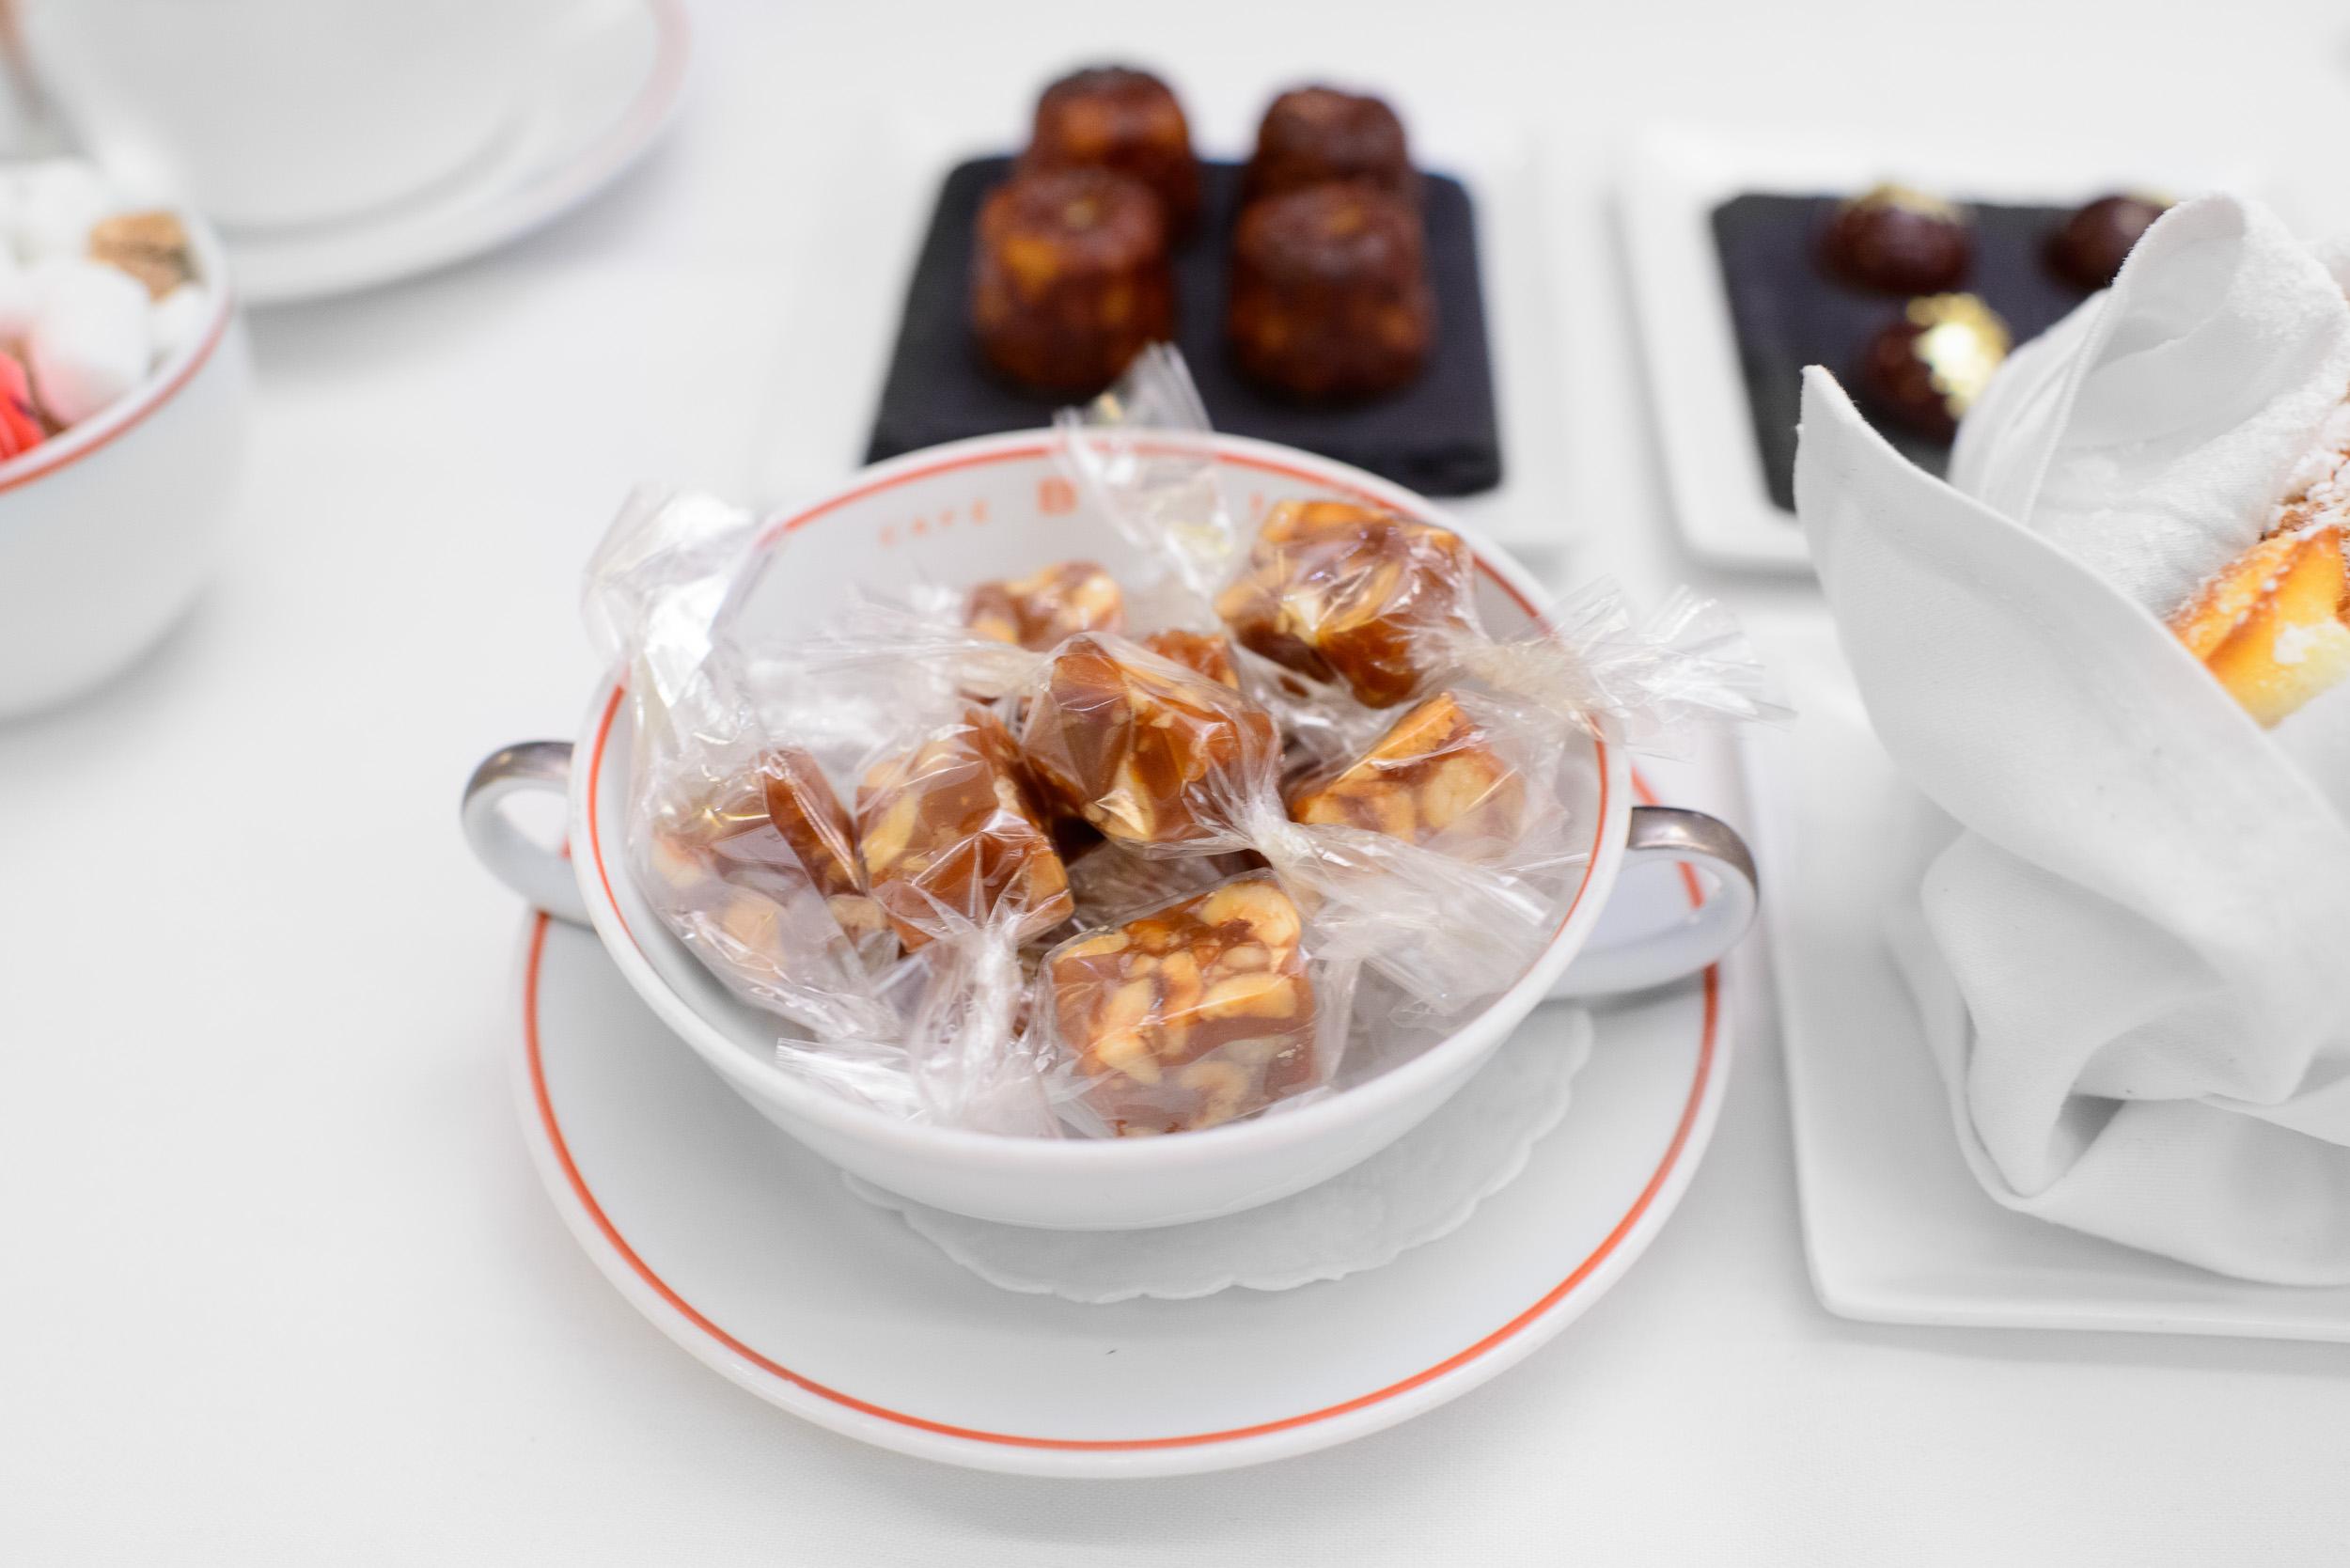 Caramel and hazelnut